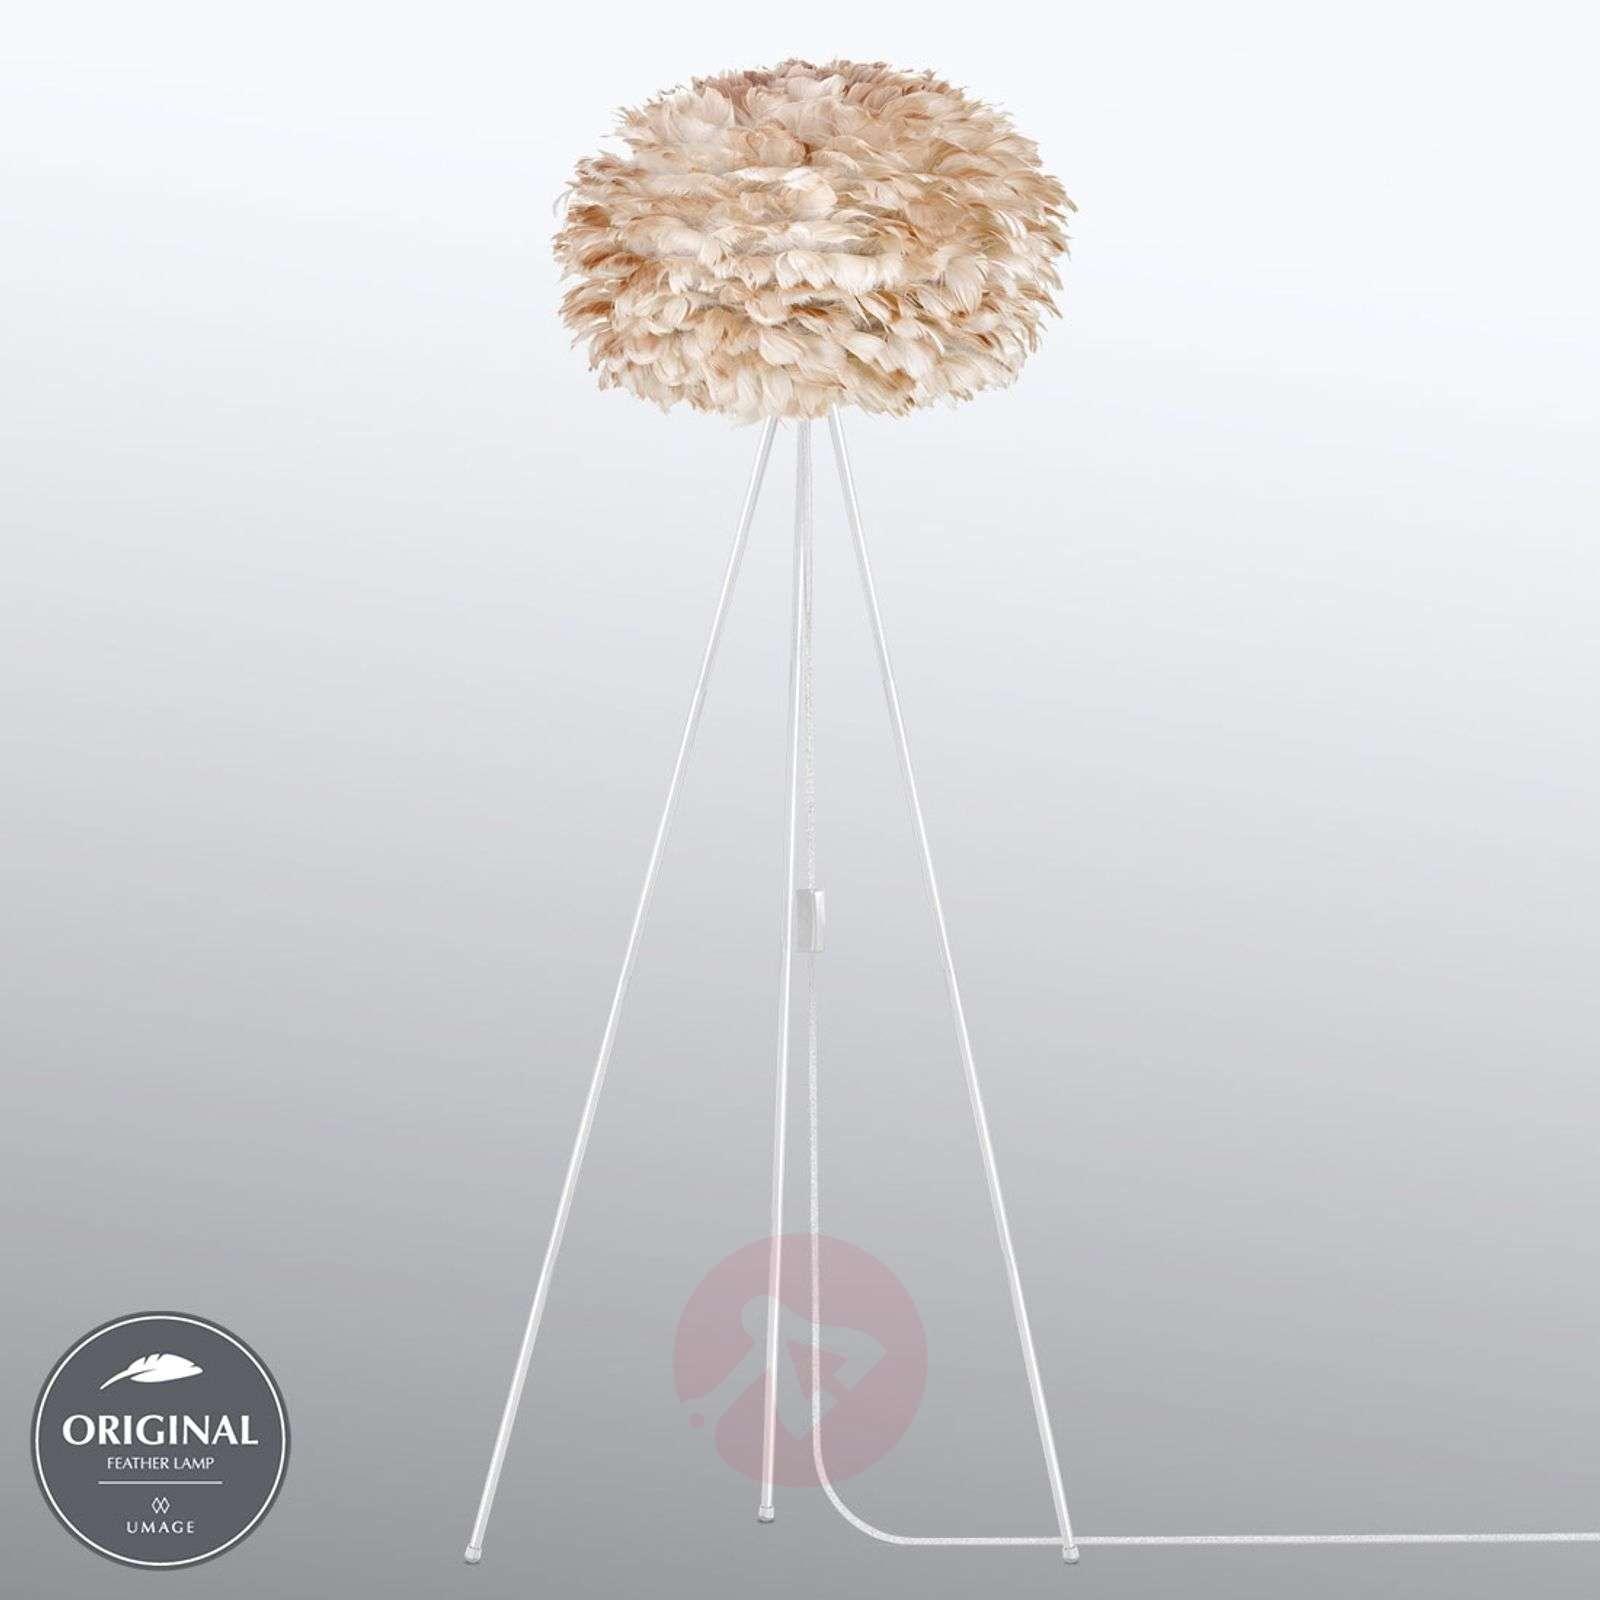 UMAGE Eos medium floor lamp tripod light brown-9521126-01